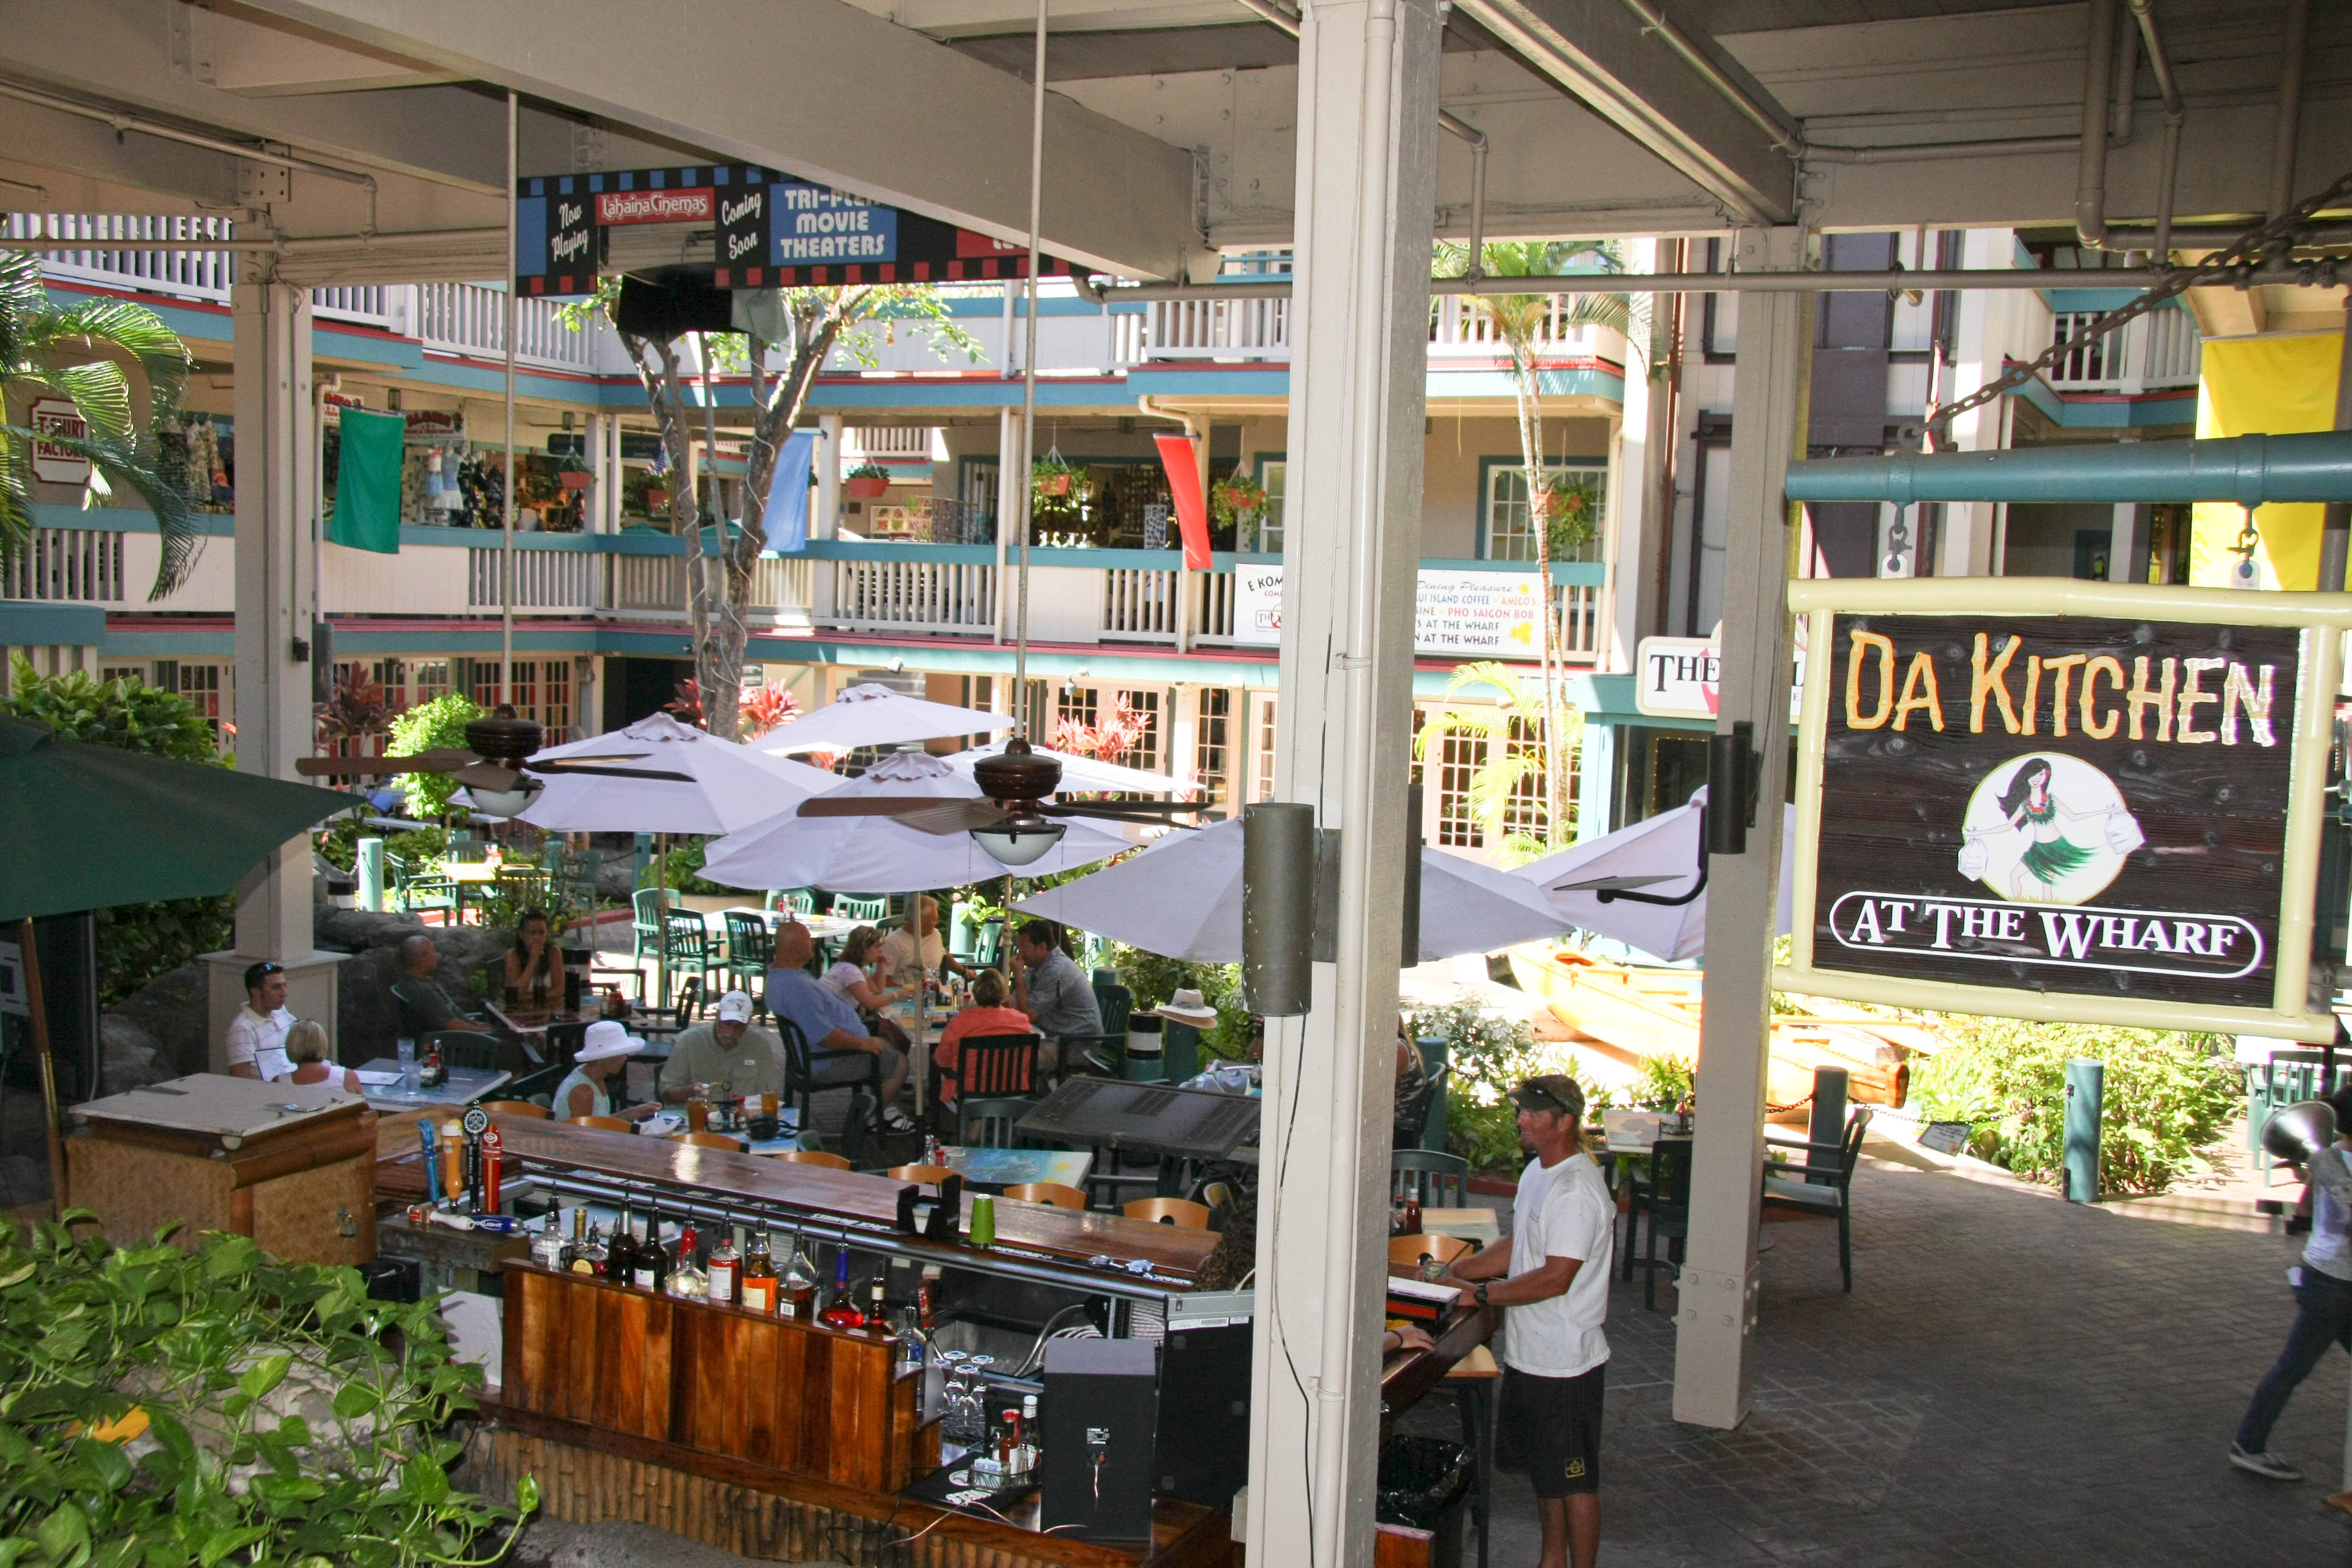 dakitchenwharf2  Maui Restaurants Blog